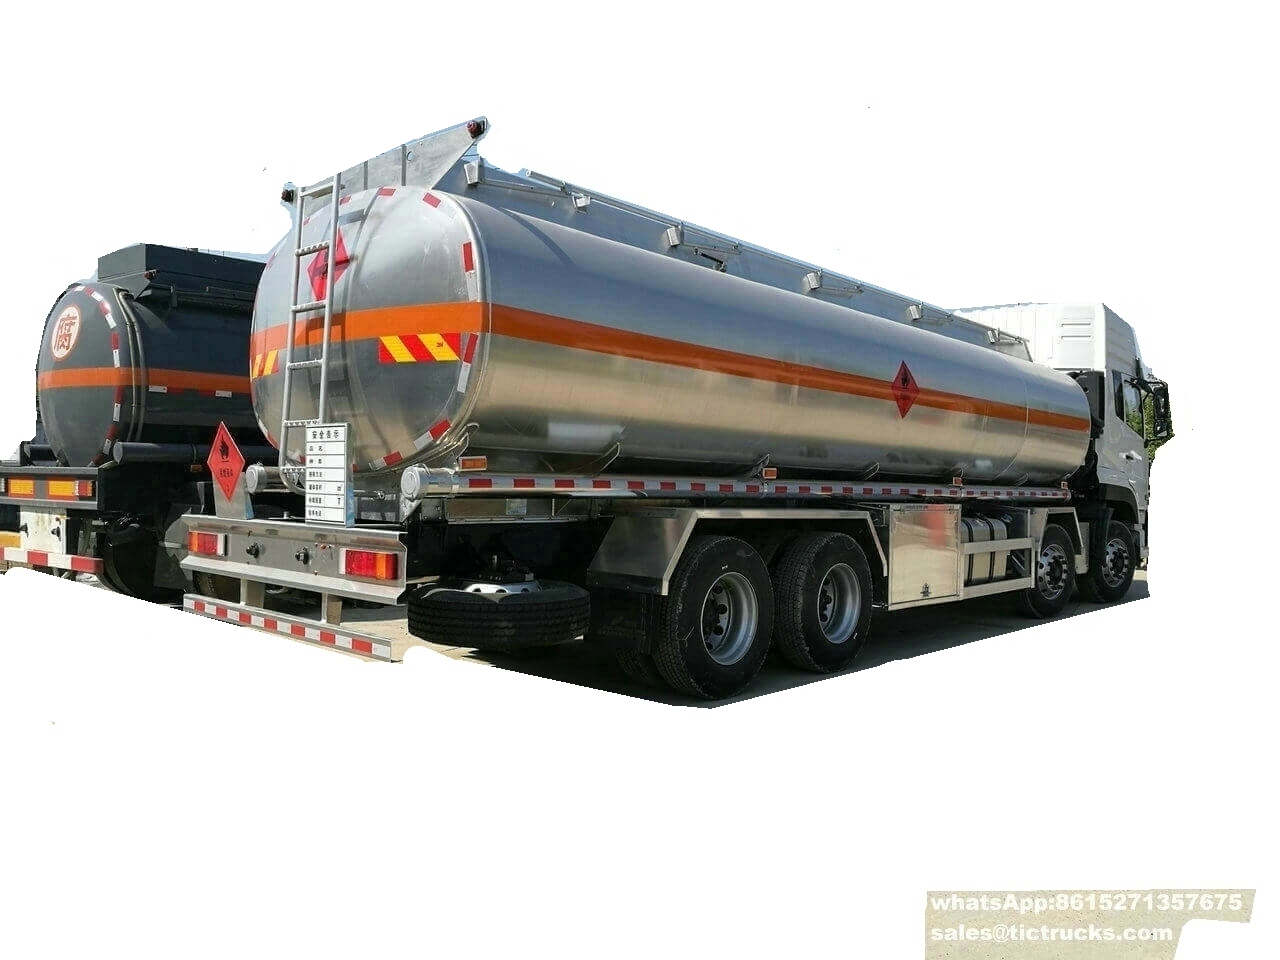 Camion-citerne -31T-dongfeng truck.jpg d'alliage d'aluminium